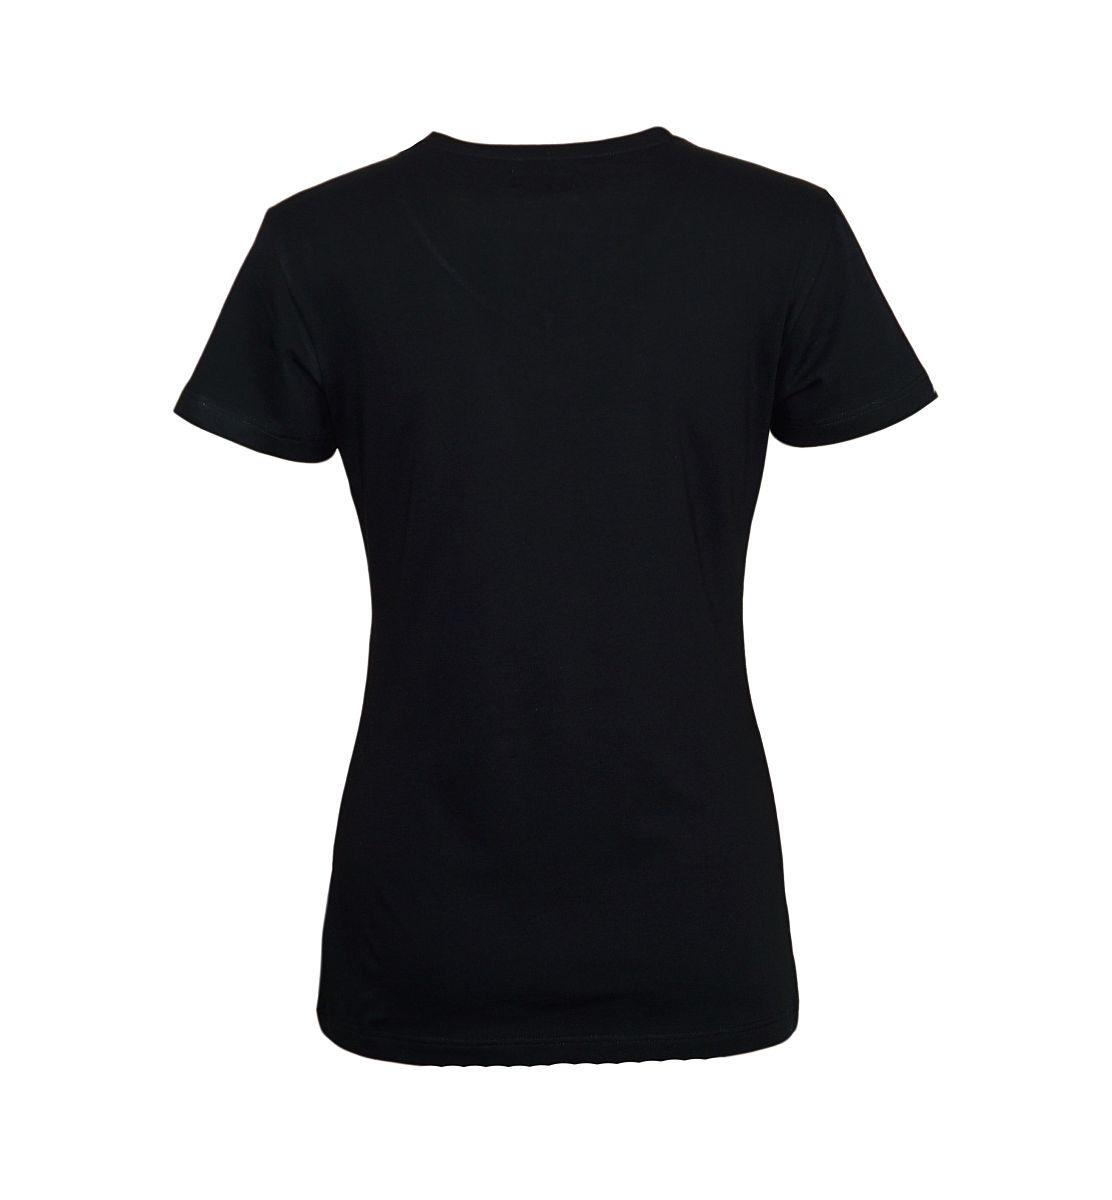 Emporio Armani Damen Shirt T-Shirt Rundhals 163139 7A263 00020 NERO HW17-EADS1